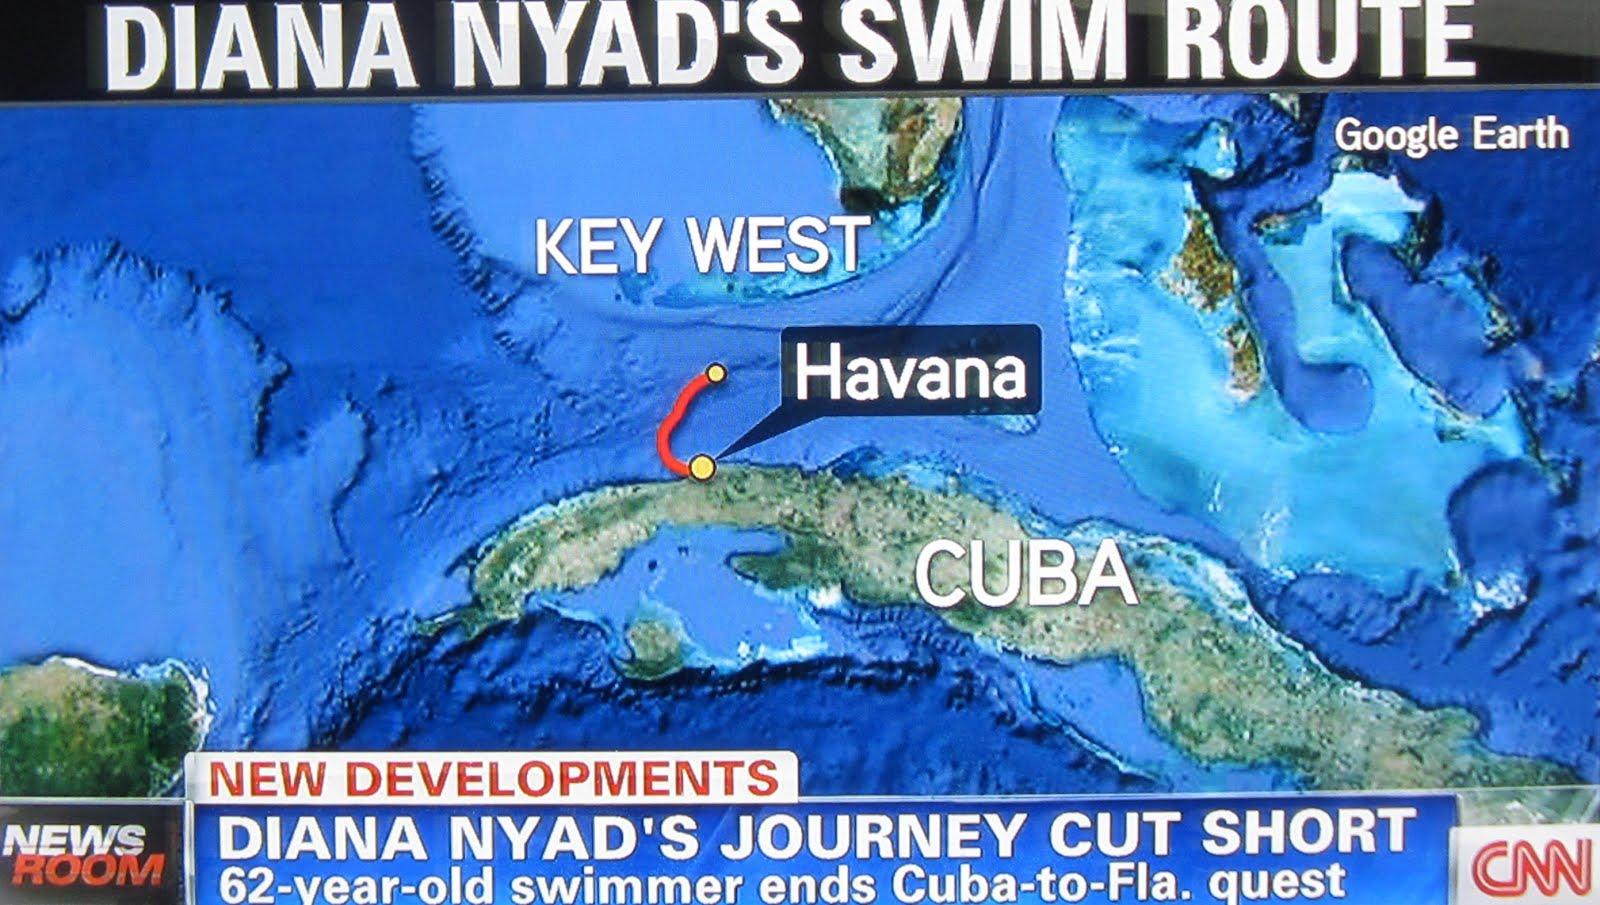 http://4.bp.blogspot.com/-xohn0qxvvOY/UDOXST-VtkI/AAAAAAABn2w/Q1jTJsbGZno/s1600/NyadSwim.jpg